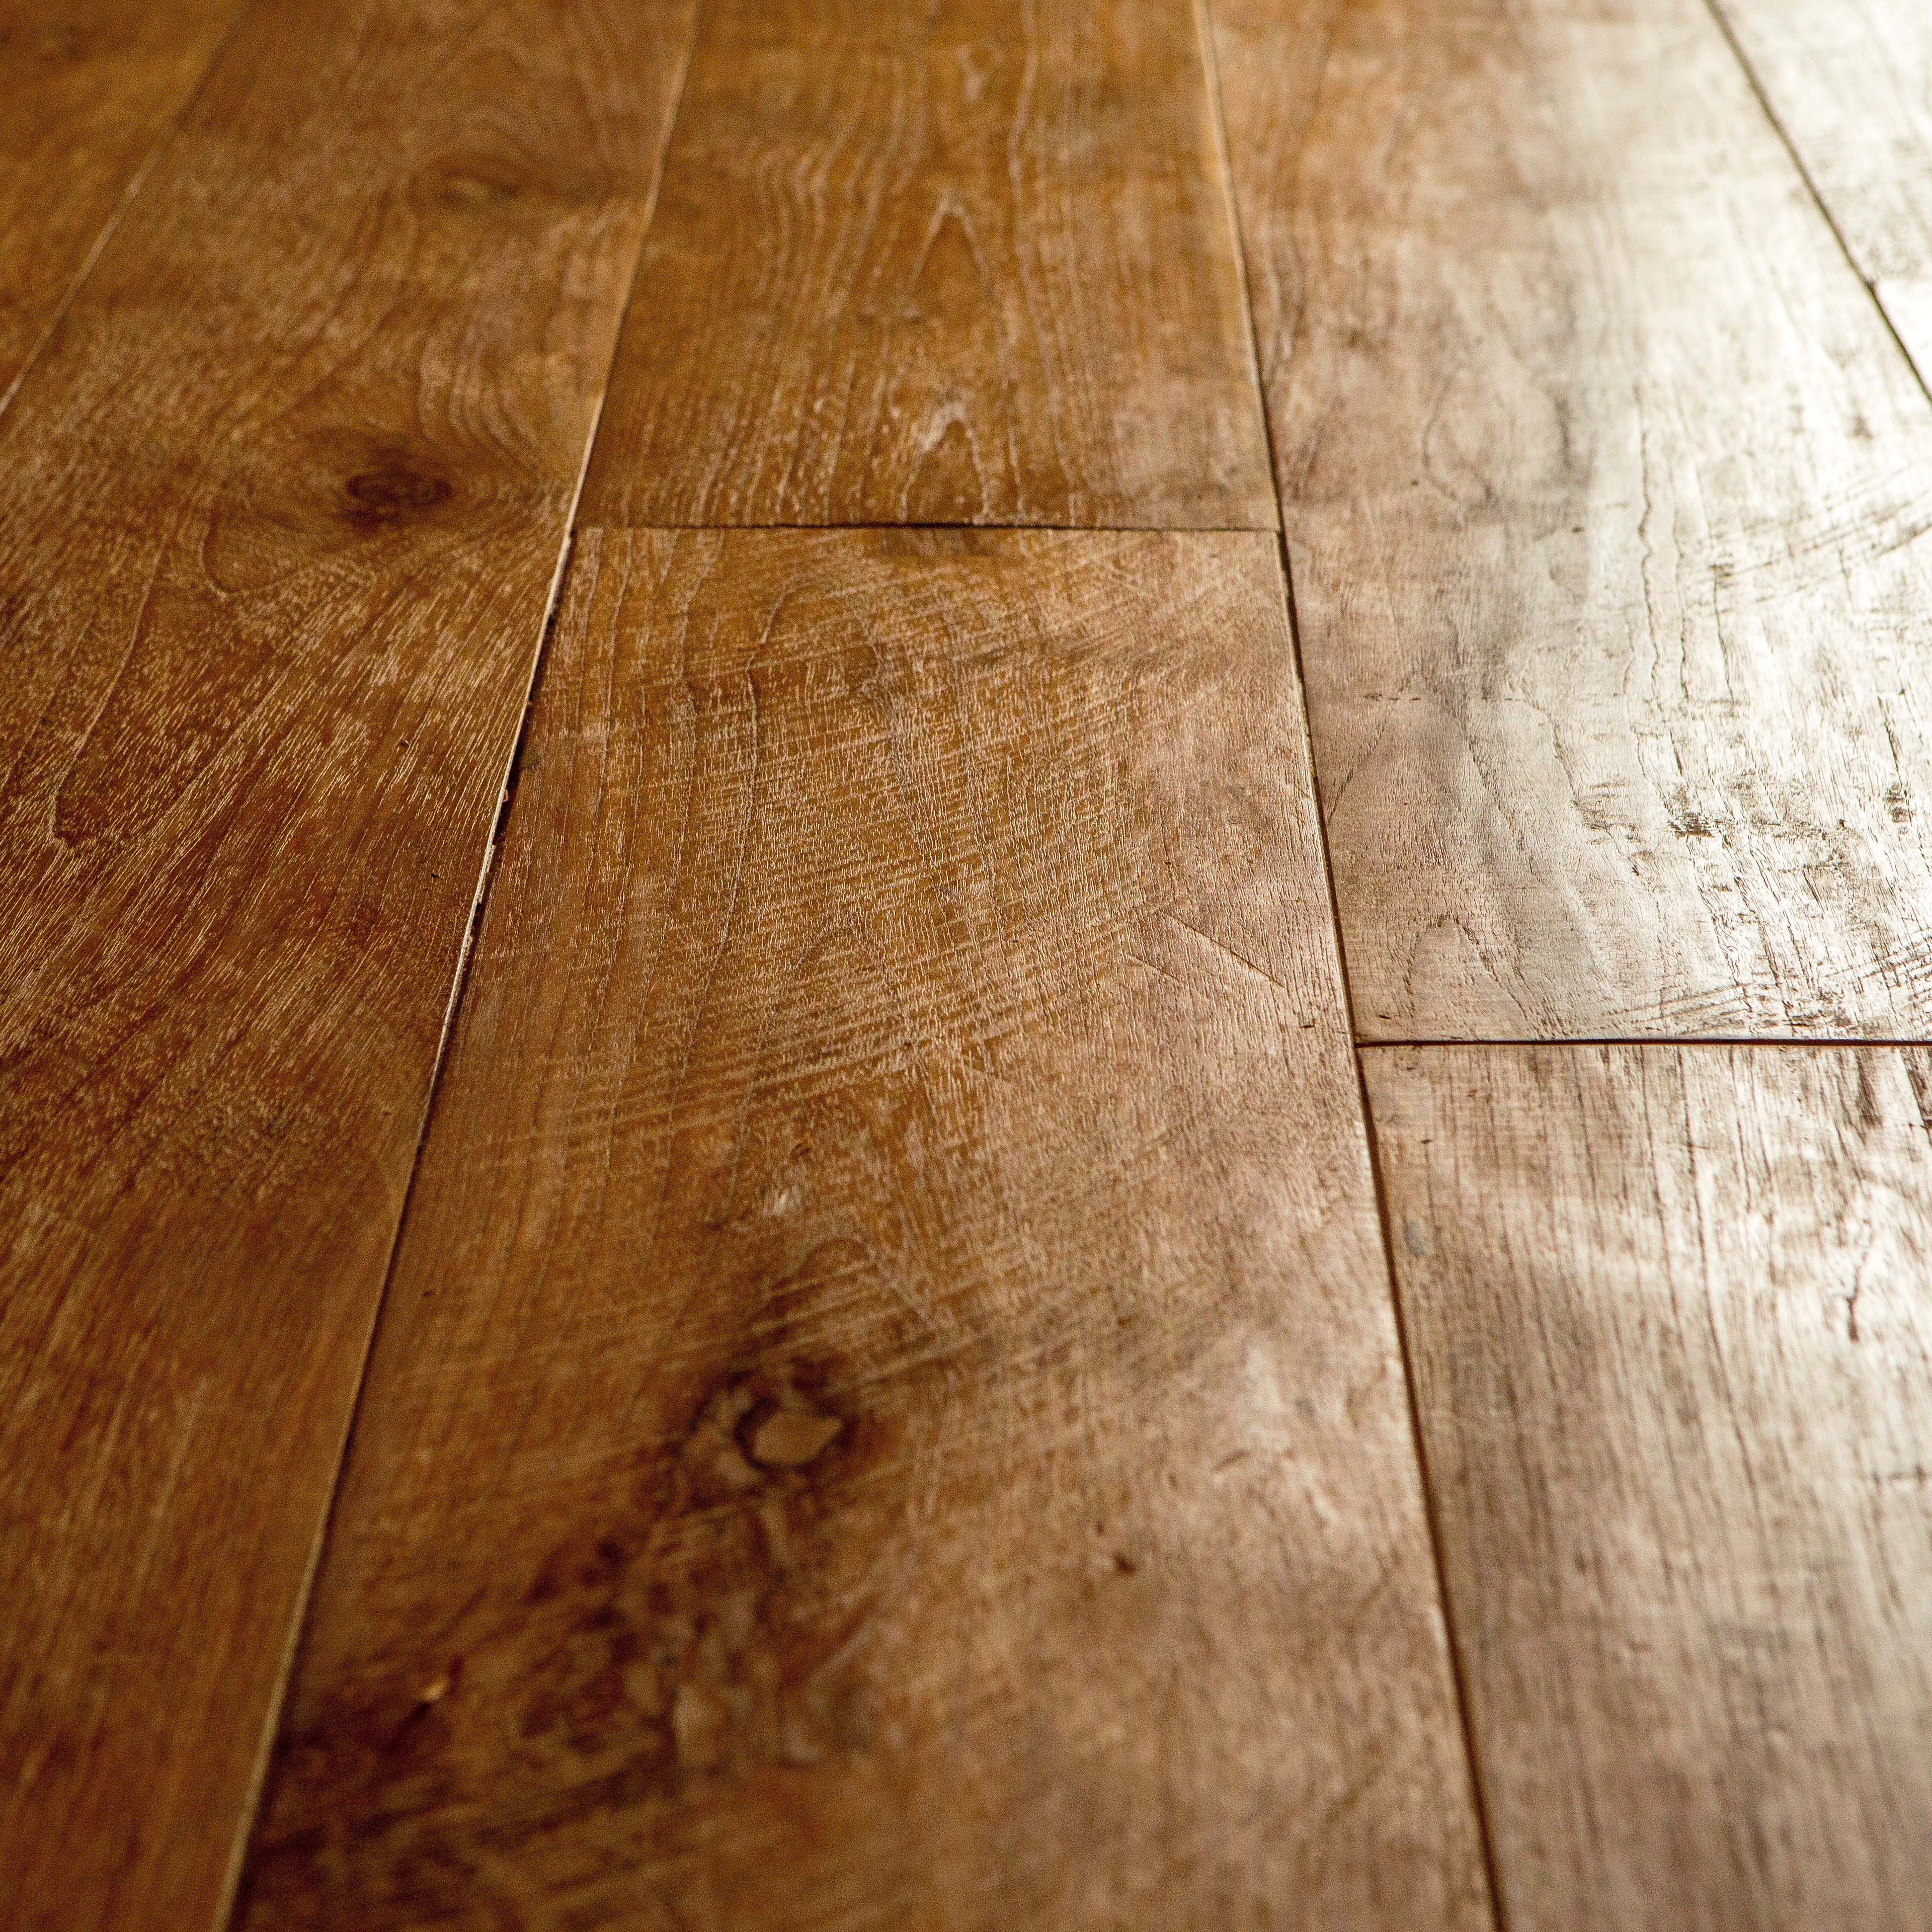 classico patina wax finish3 - Reclaimed Teak Flooring